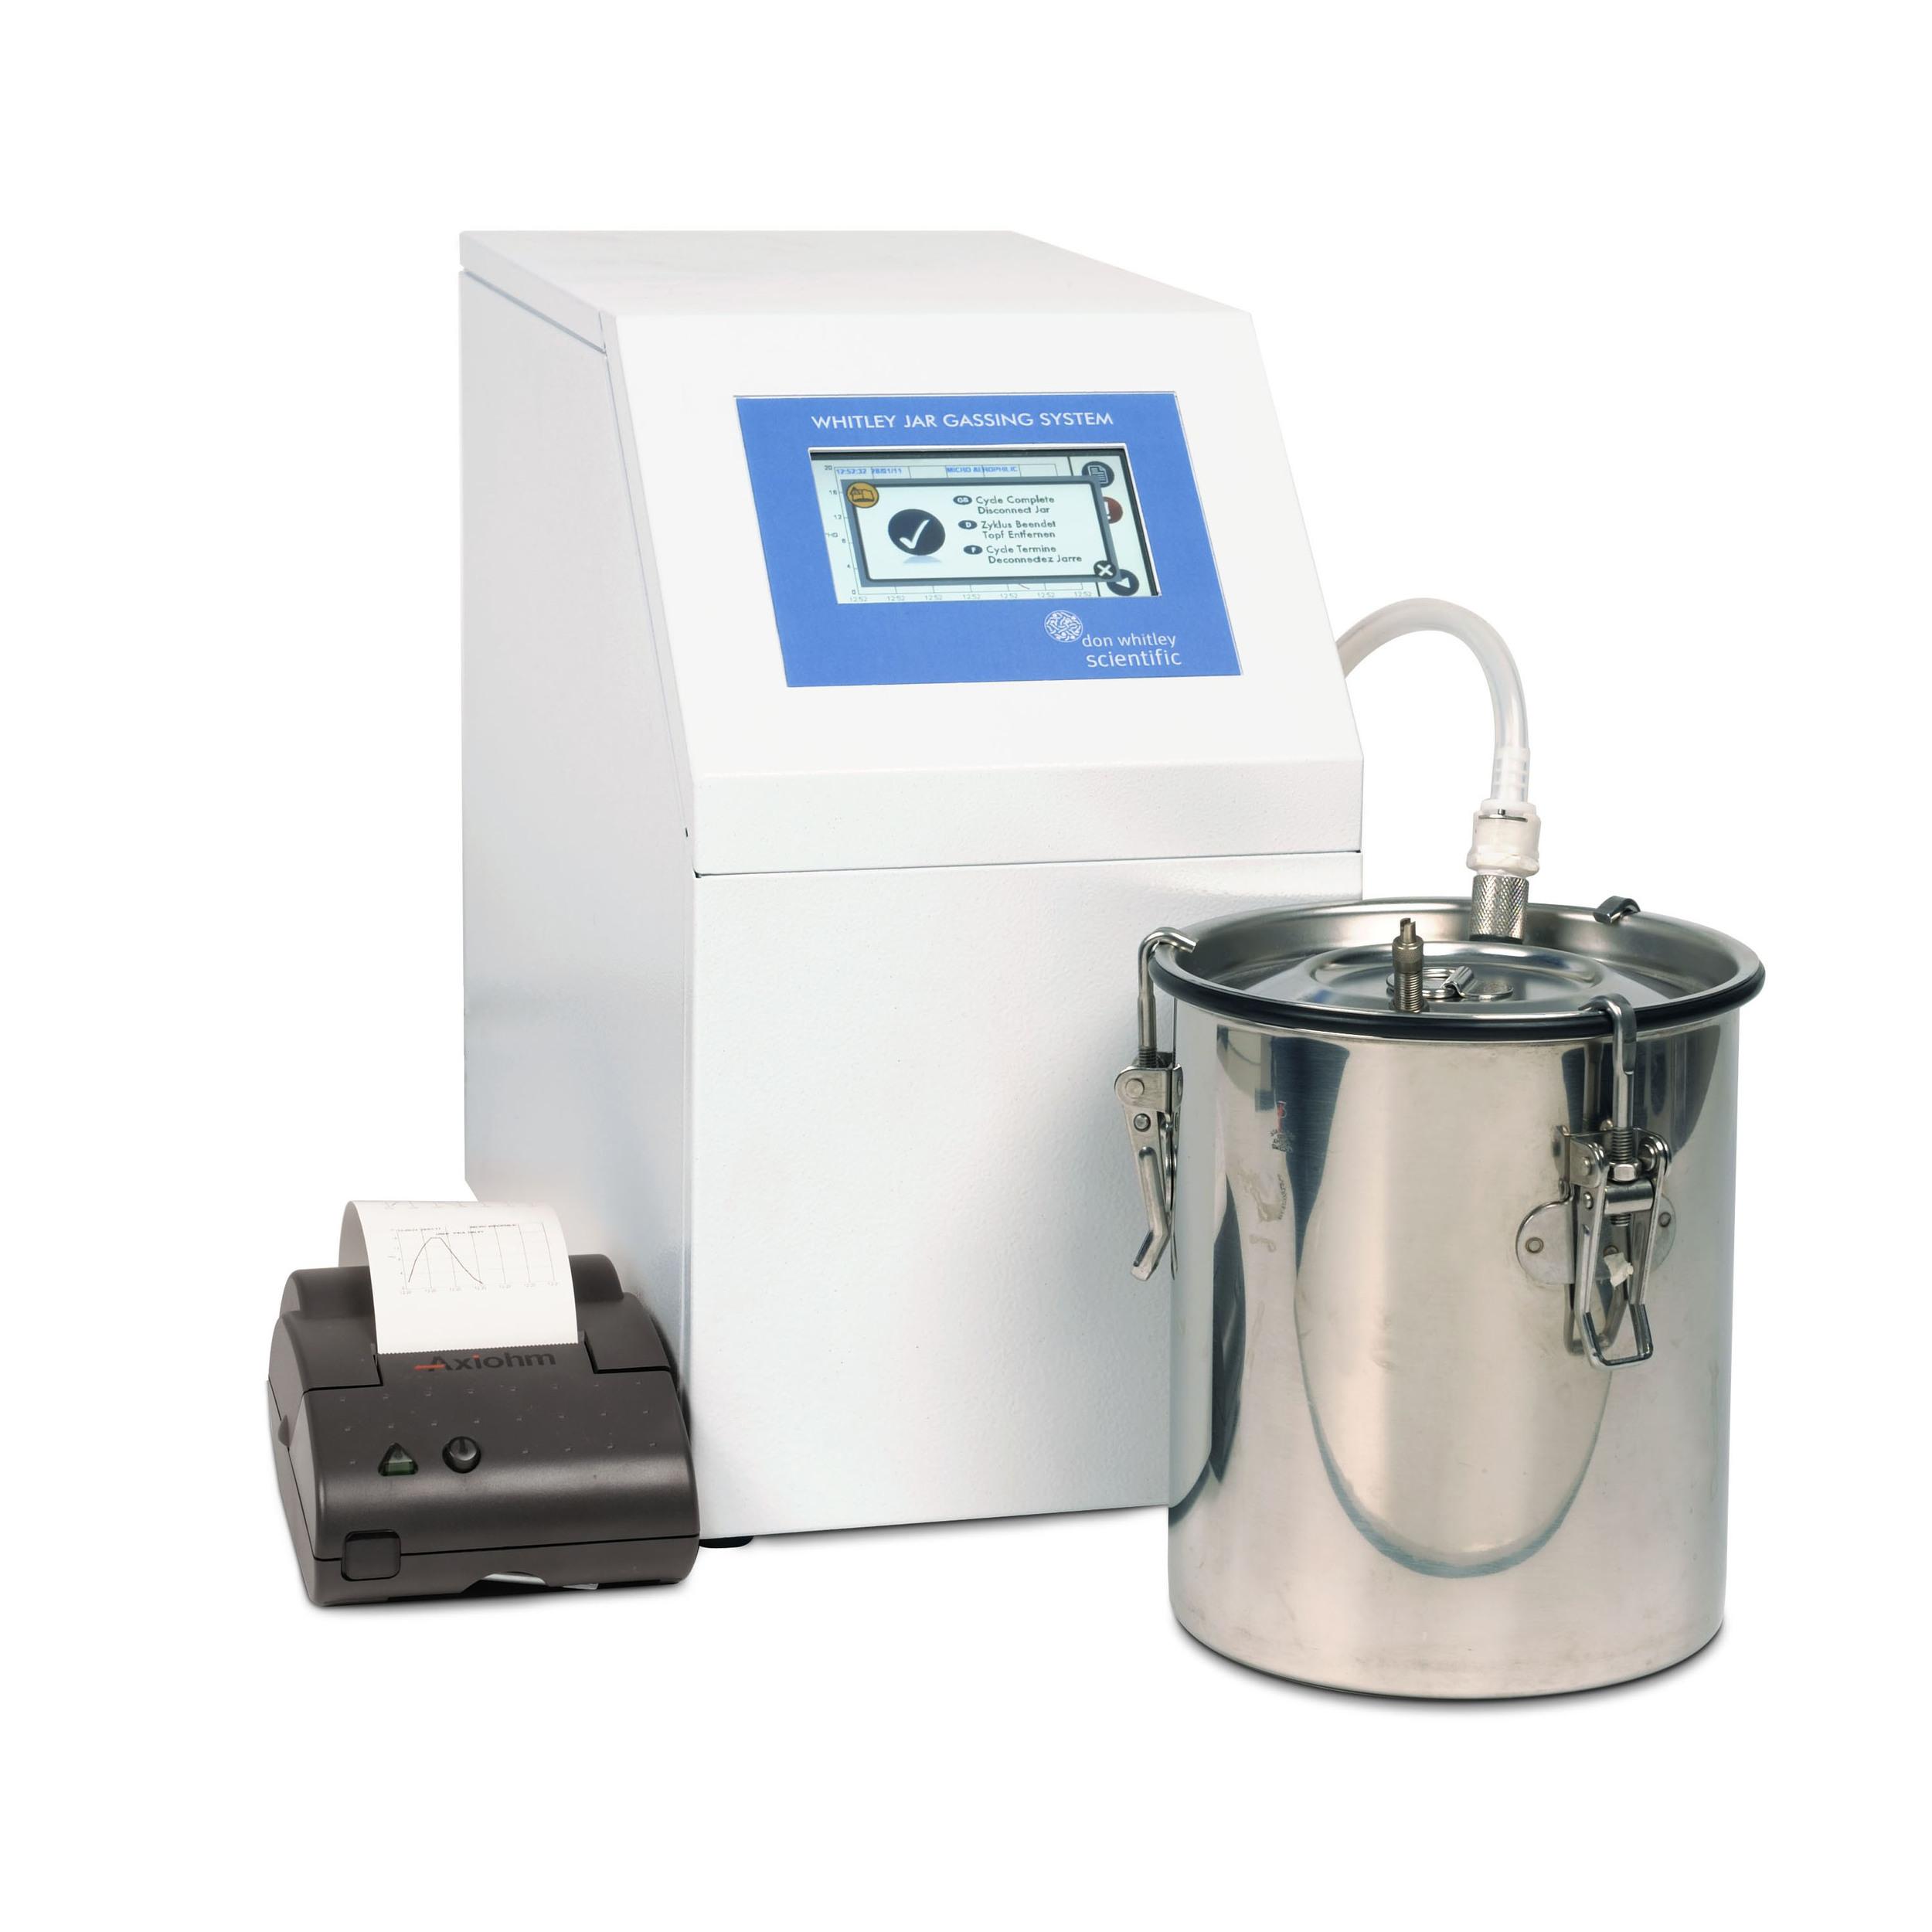 Jar Gassing System